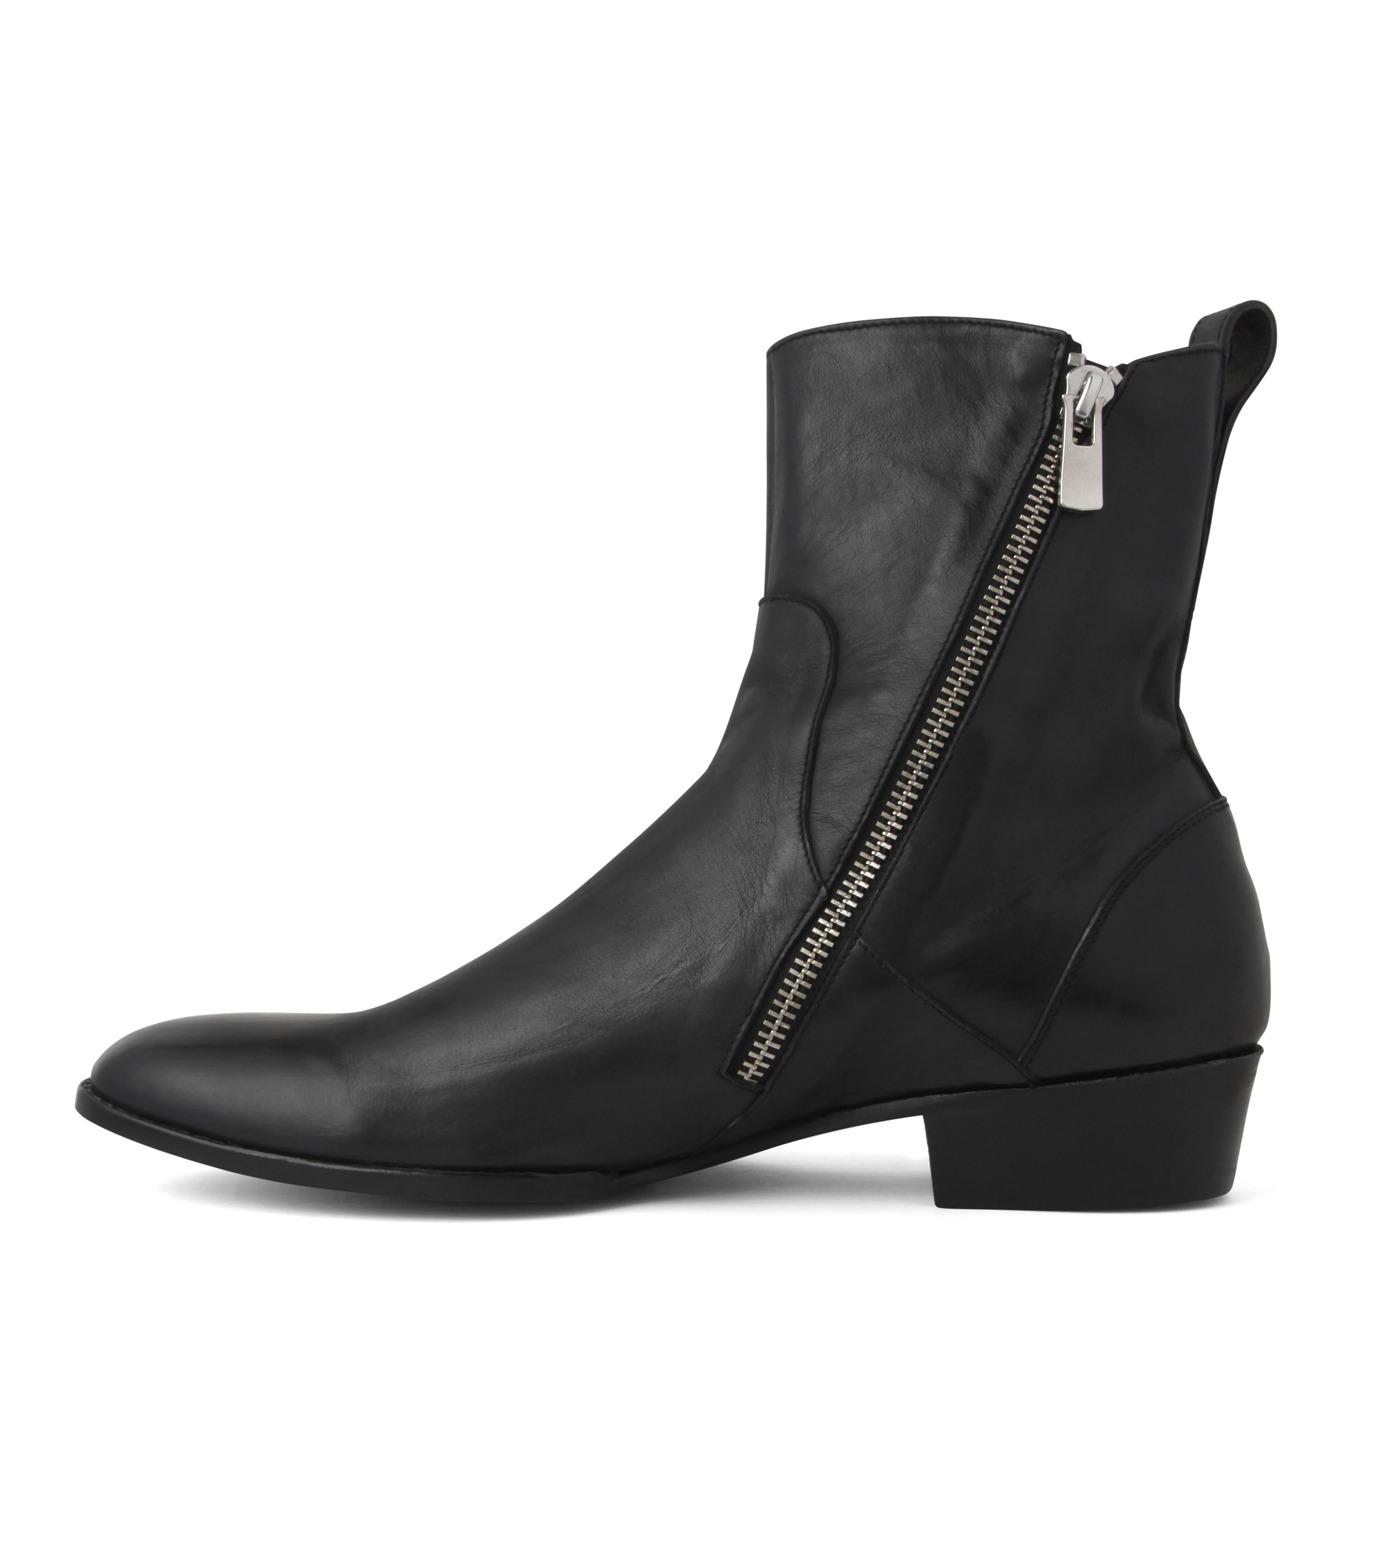 HL HEDDIE LOVU(エイチエル・エディールーヴ)のSIDE ZIP BOOTS-BLACK(シューズ/shoes)-18S90002-13 拡大詳細画像3